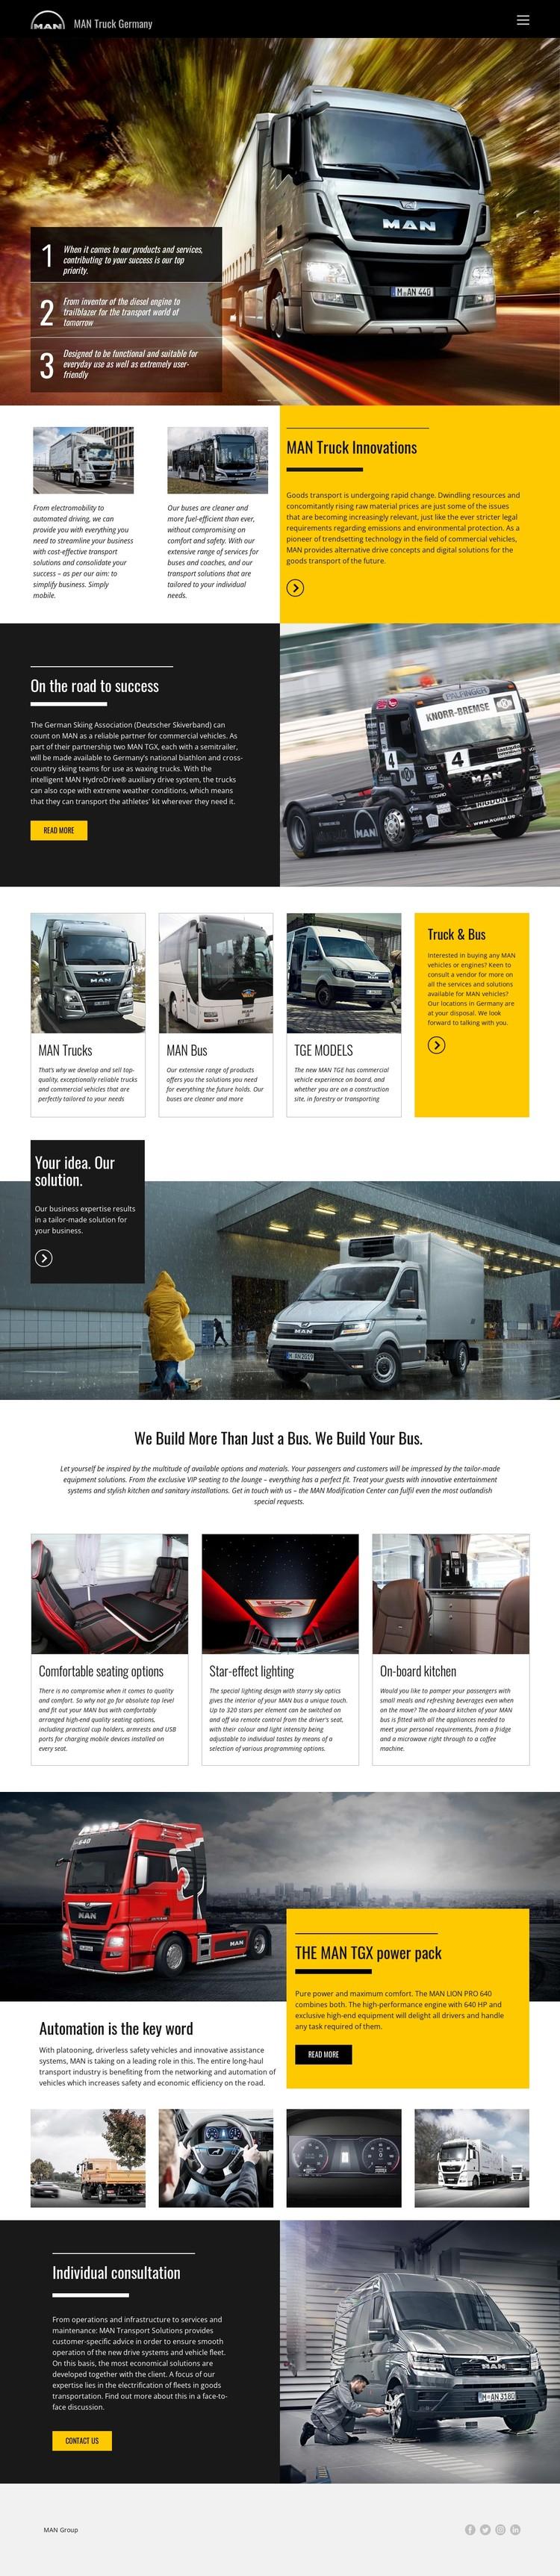 Man trucks for transportation Static Site Generator